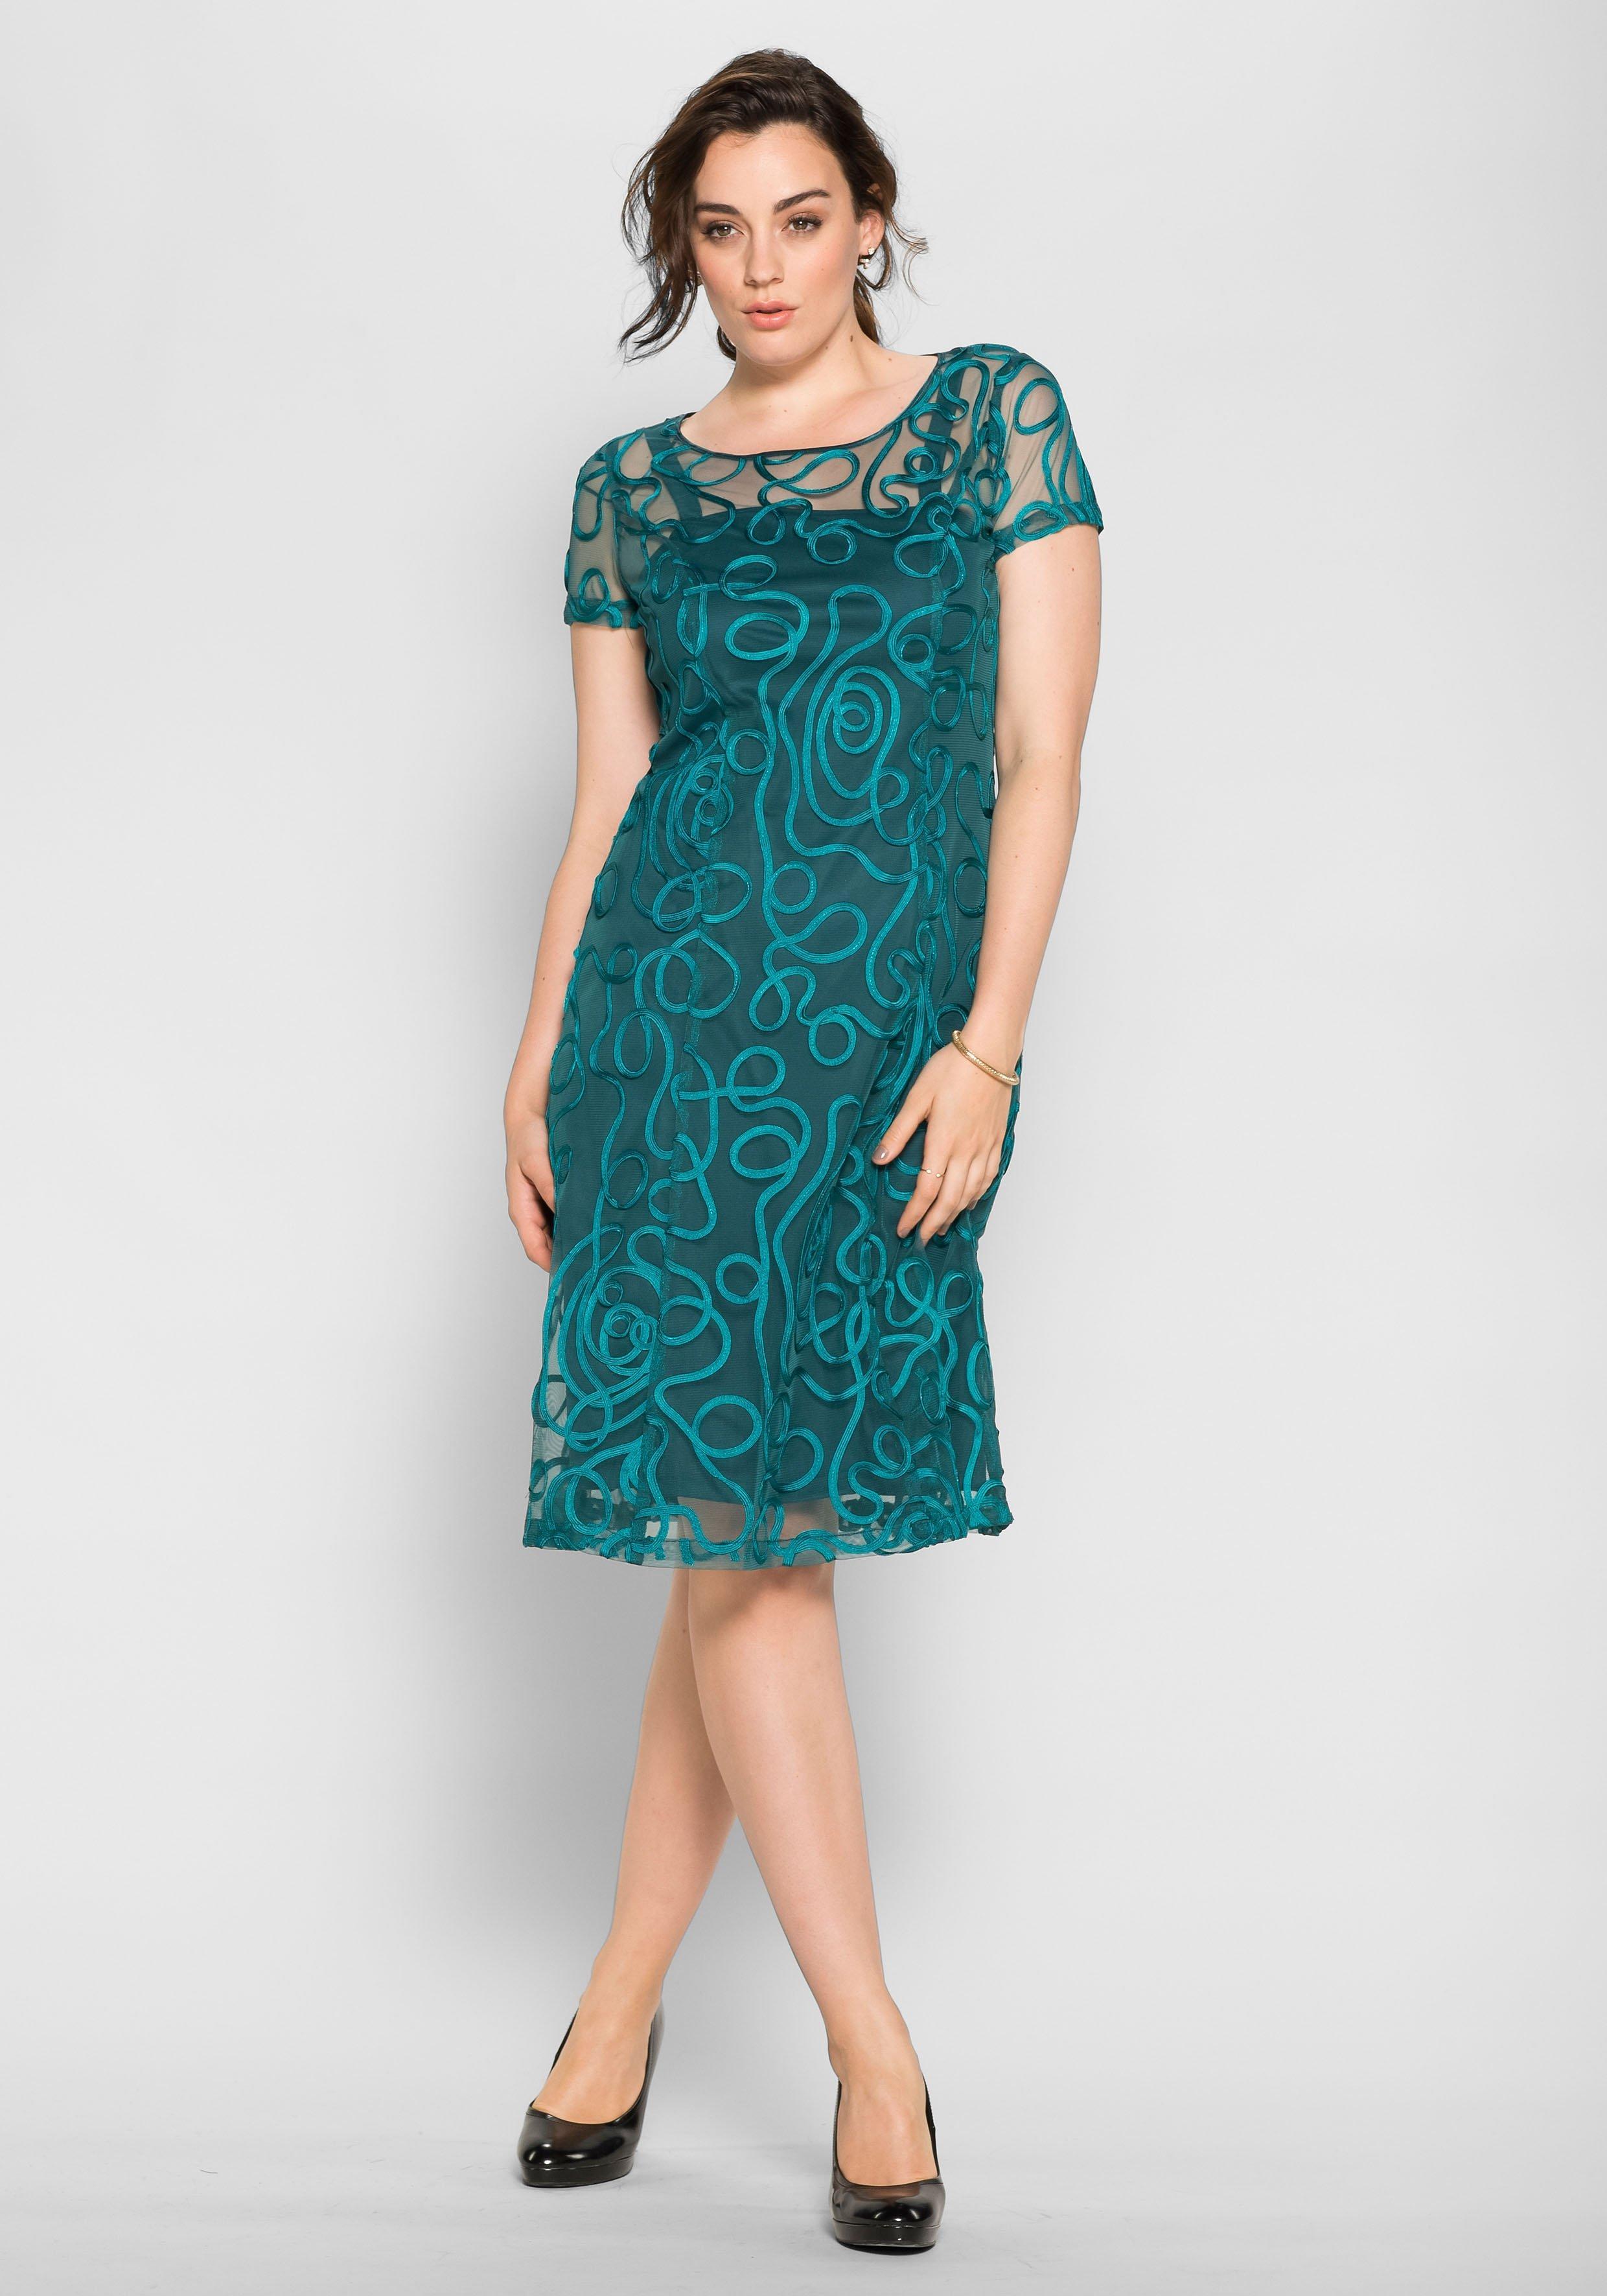 7362c742be4 Große Größen  Kleid